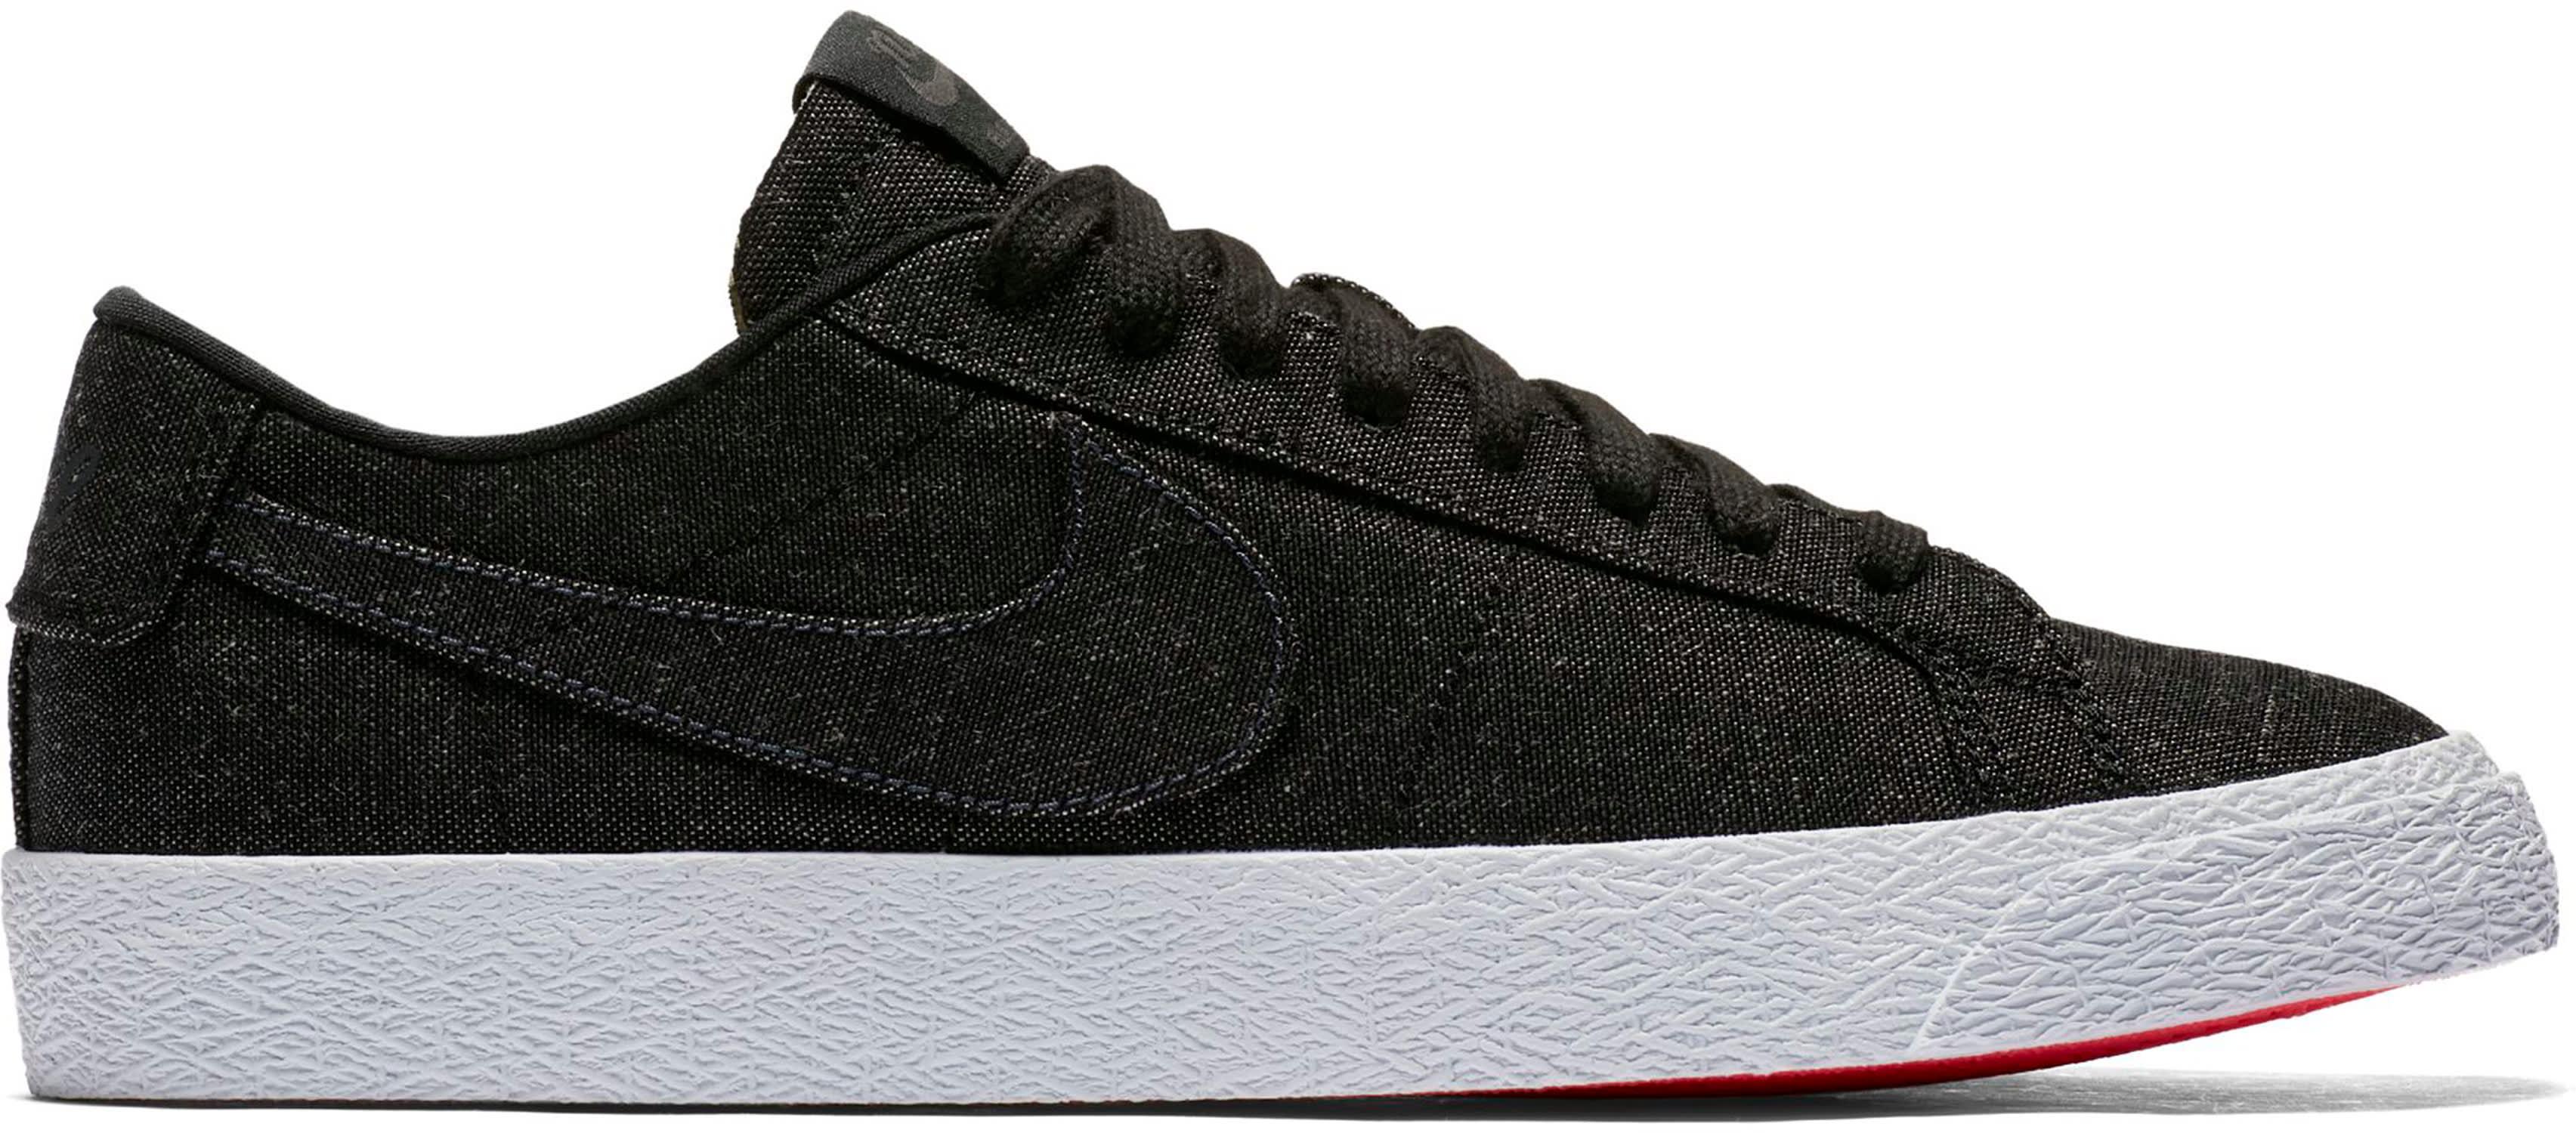 ac8c416f4c4b5 Nike SB Zoom Blazer Low Canvas Deconstructed Skate Shoes - thumbnail 1